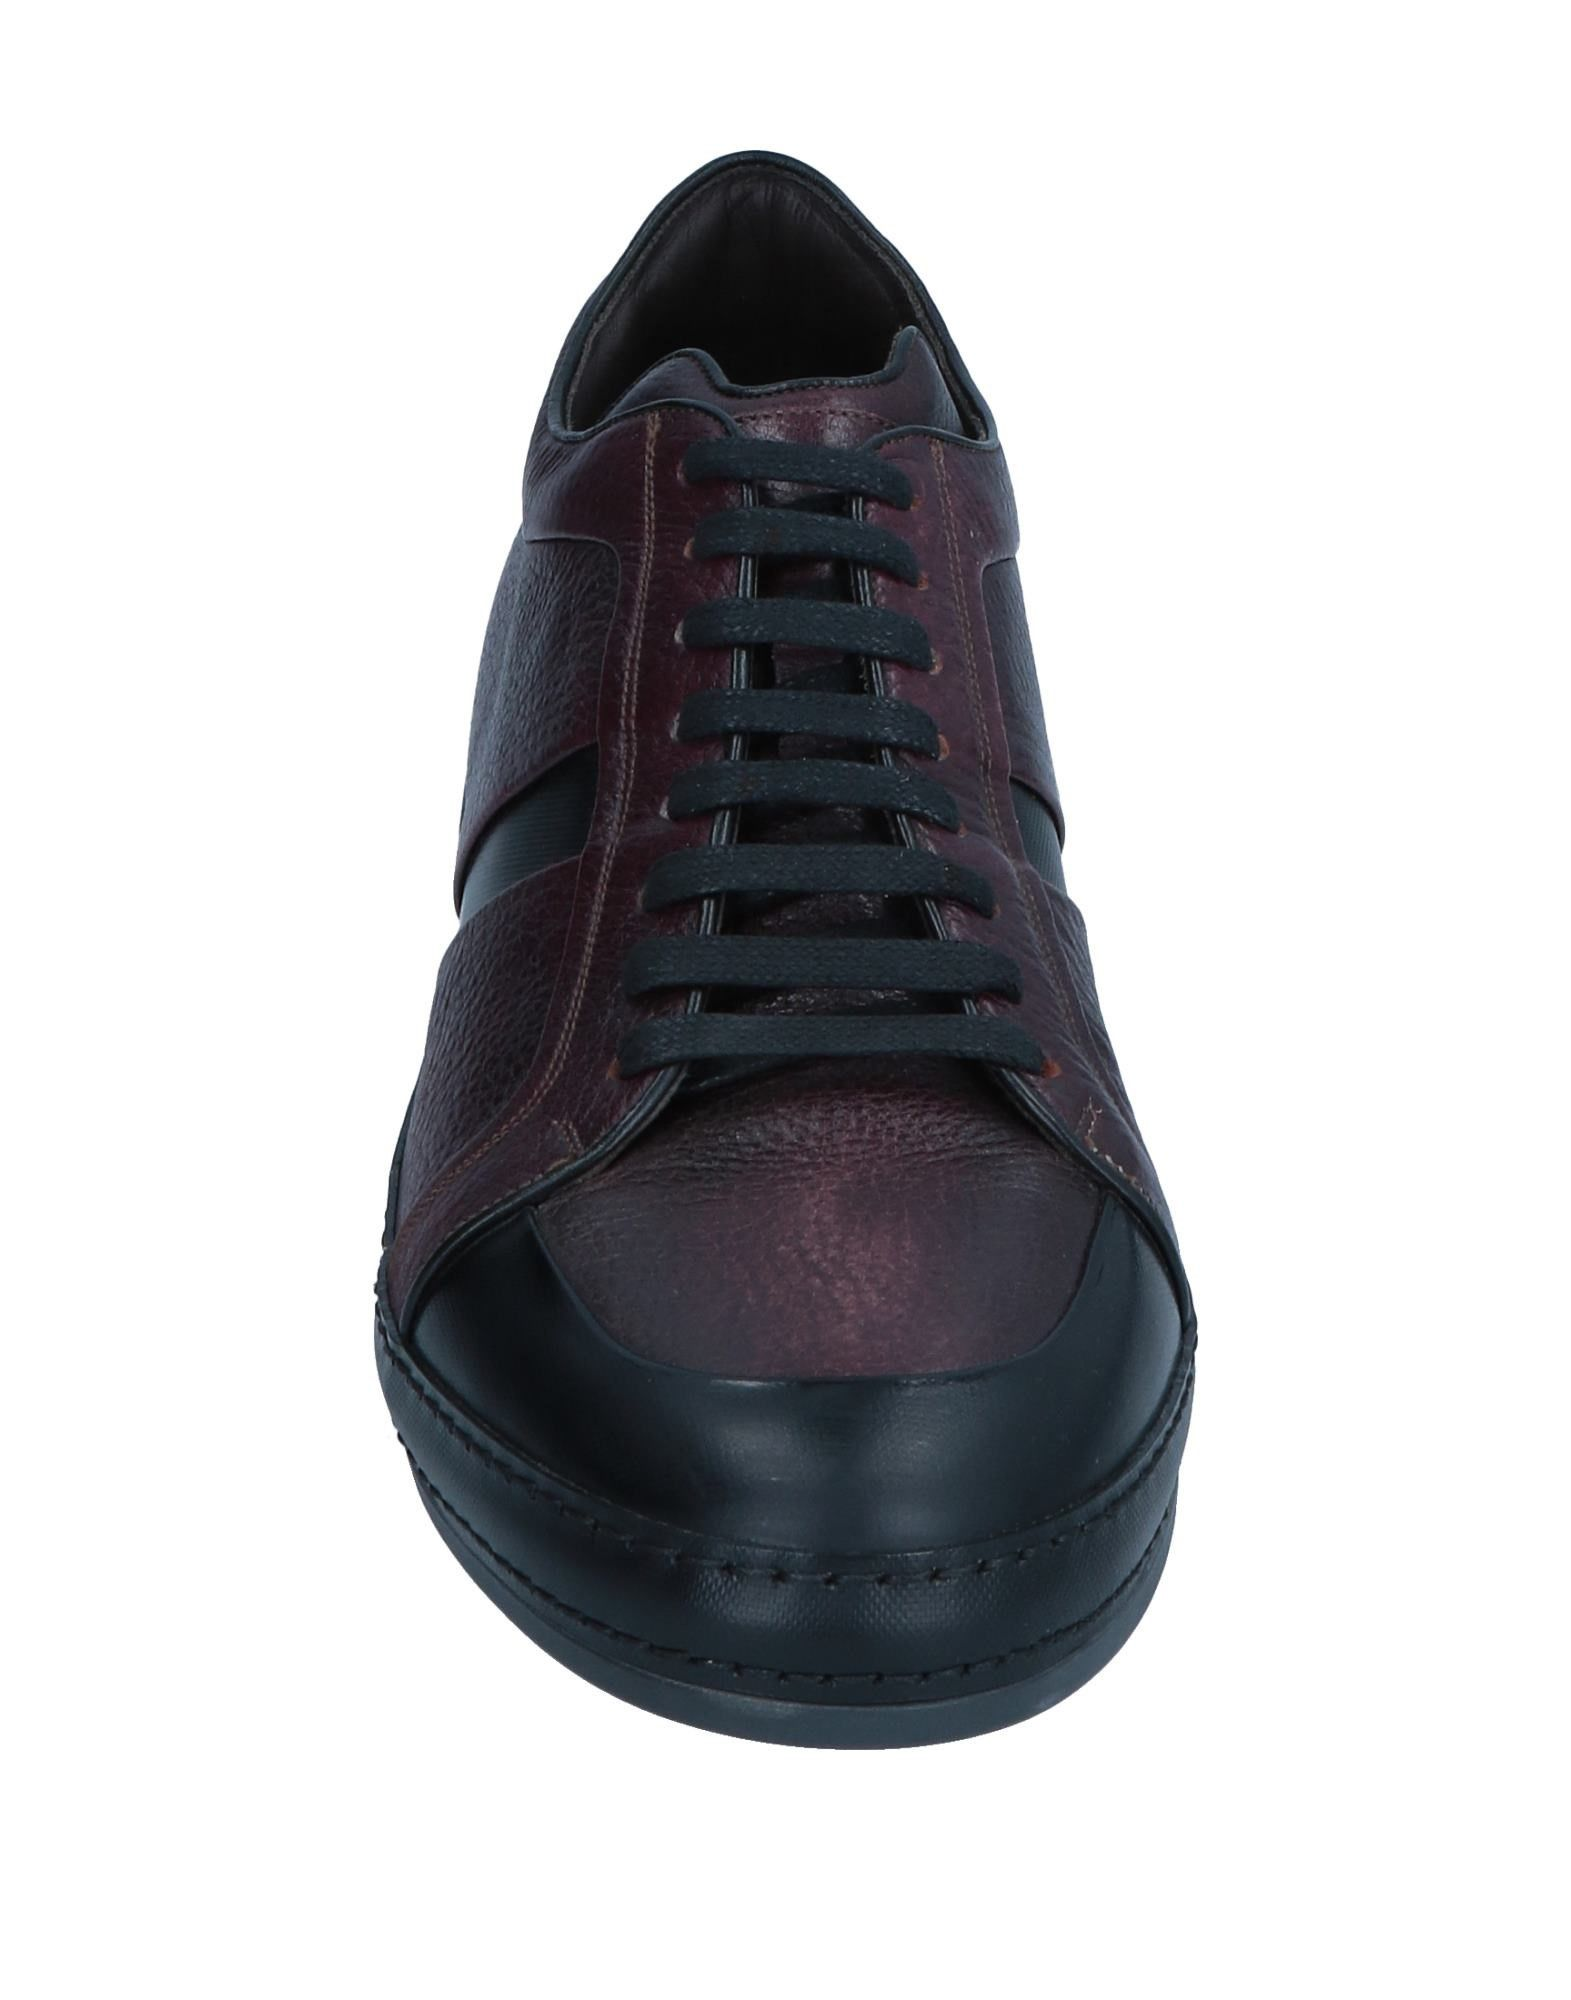 Barrett Sneakers Herren  11548219KM   11548219KM 4cab50